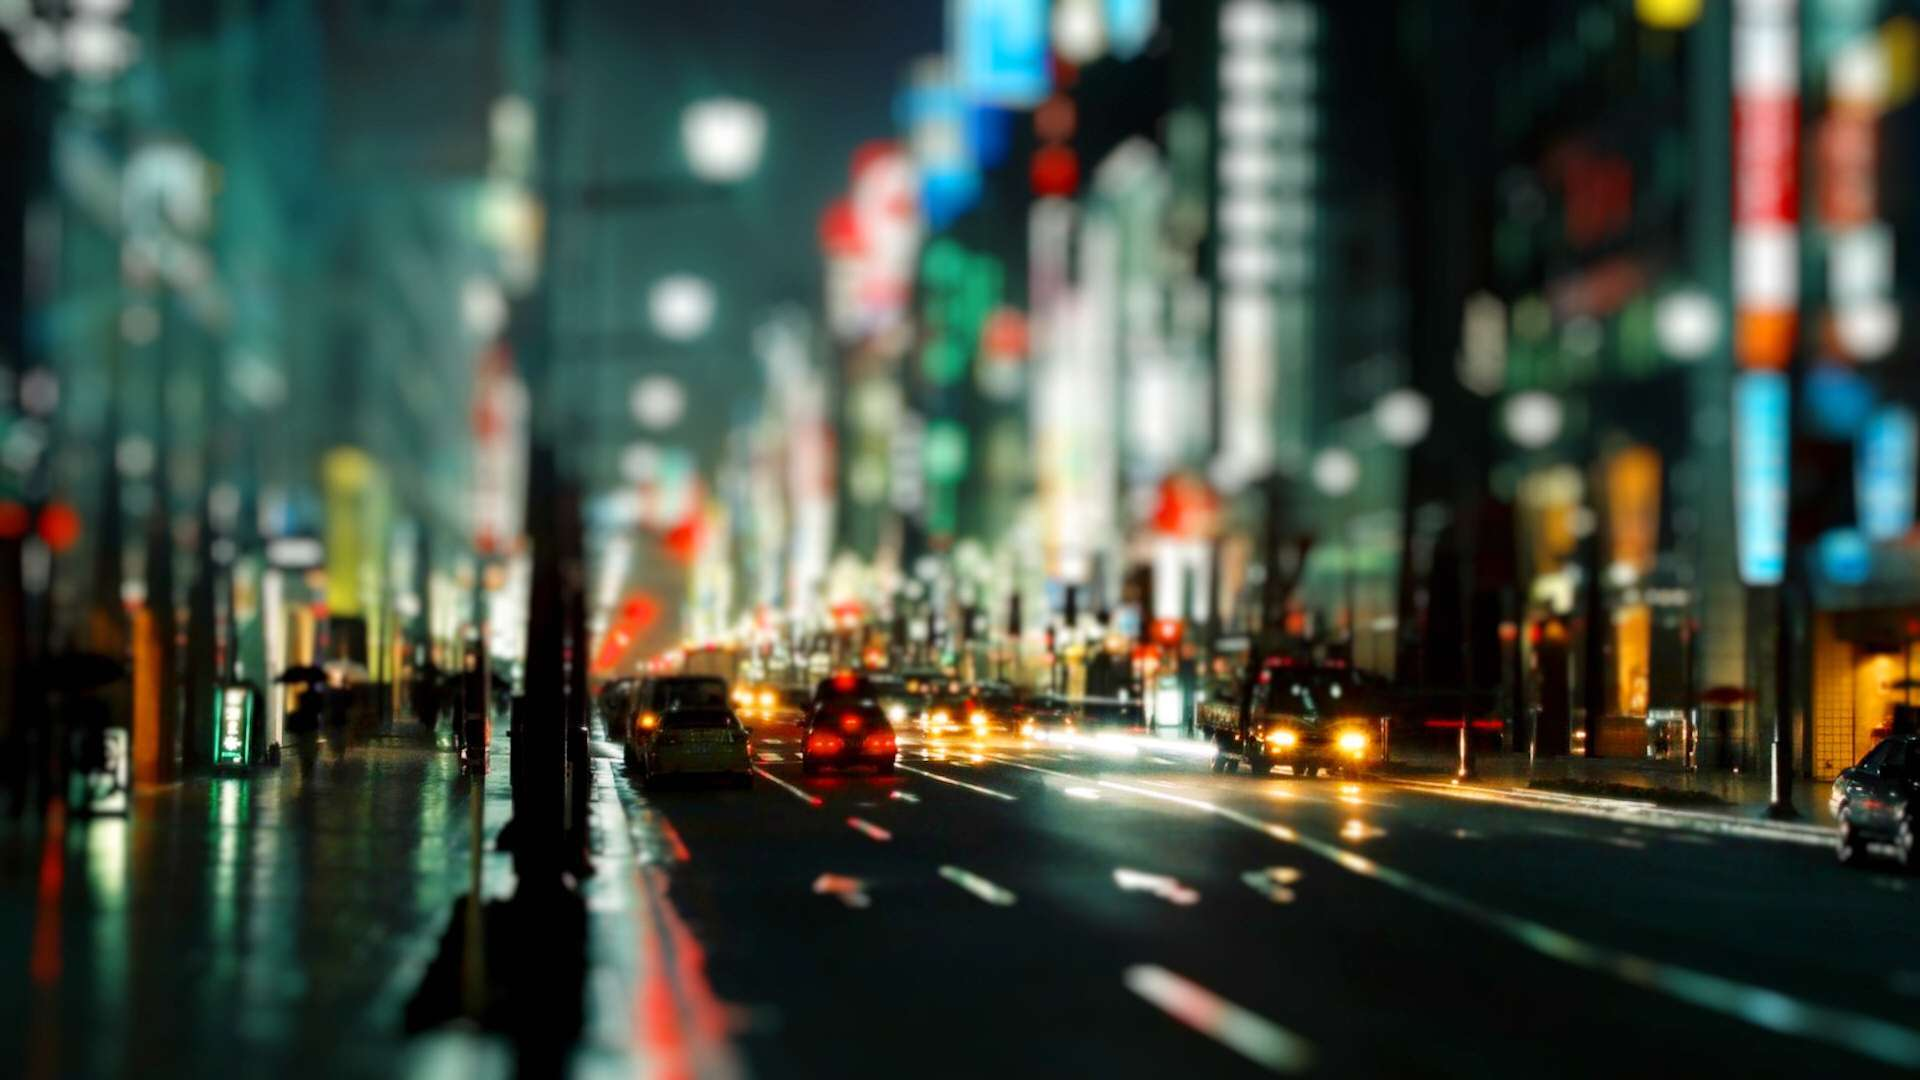 Tokyo in Tilt HD Wallpaper FullHDWpp   Full HD Wallpapers 1920x1080 1920x1080